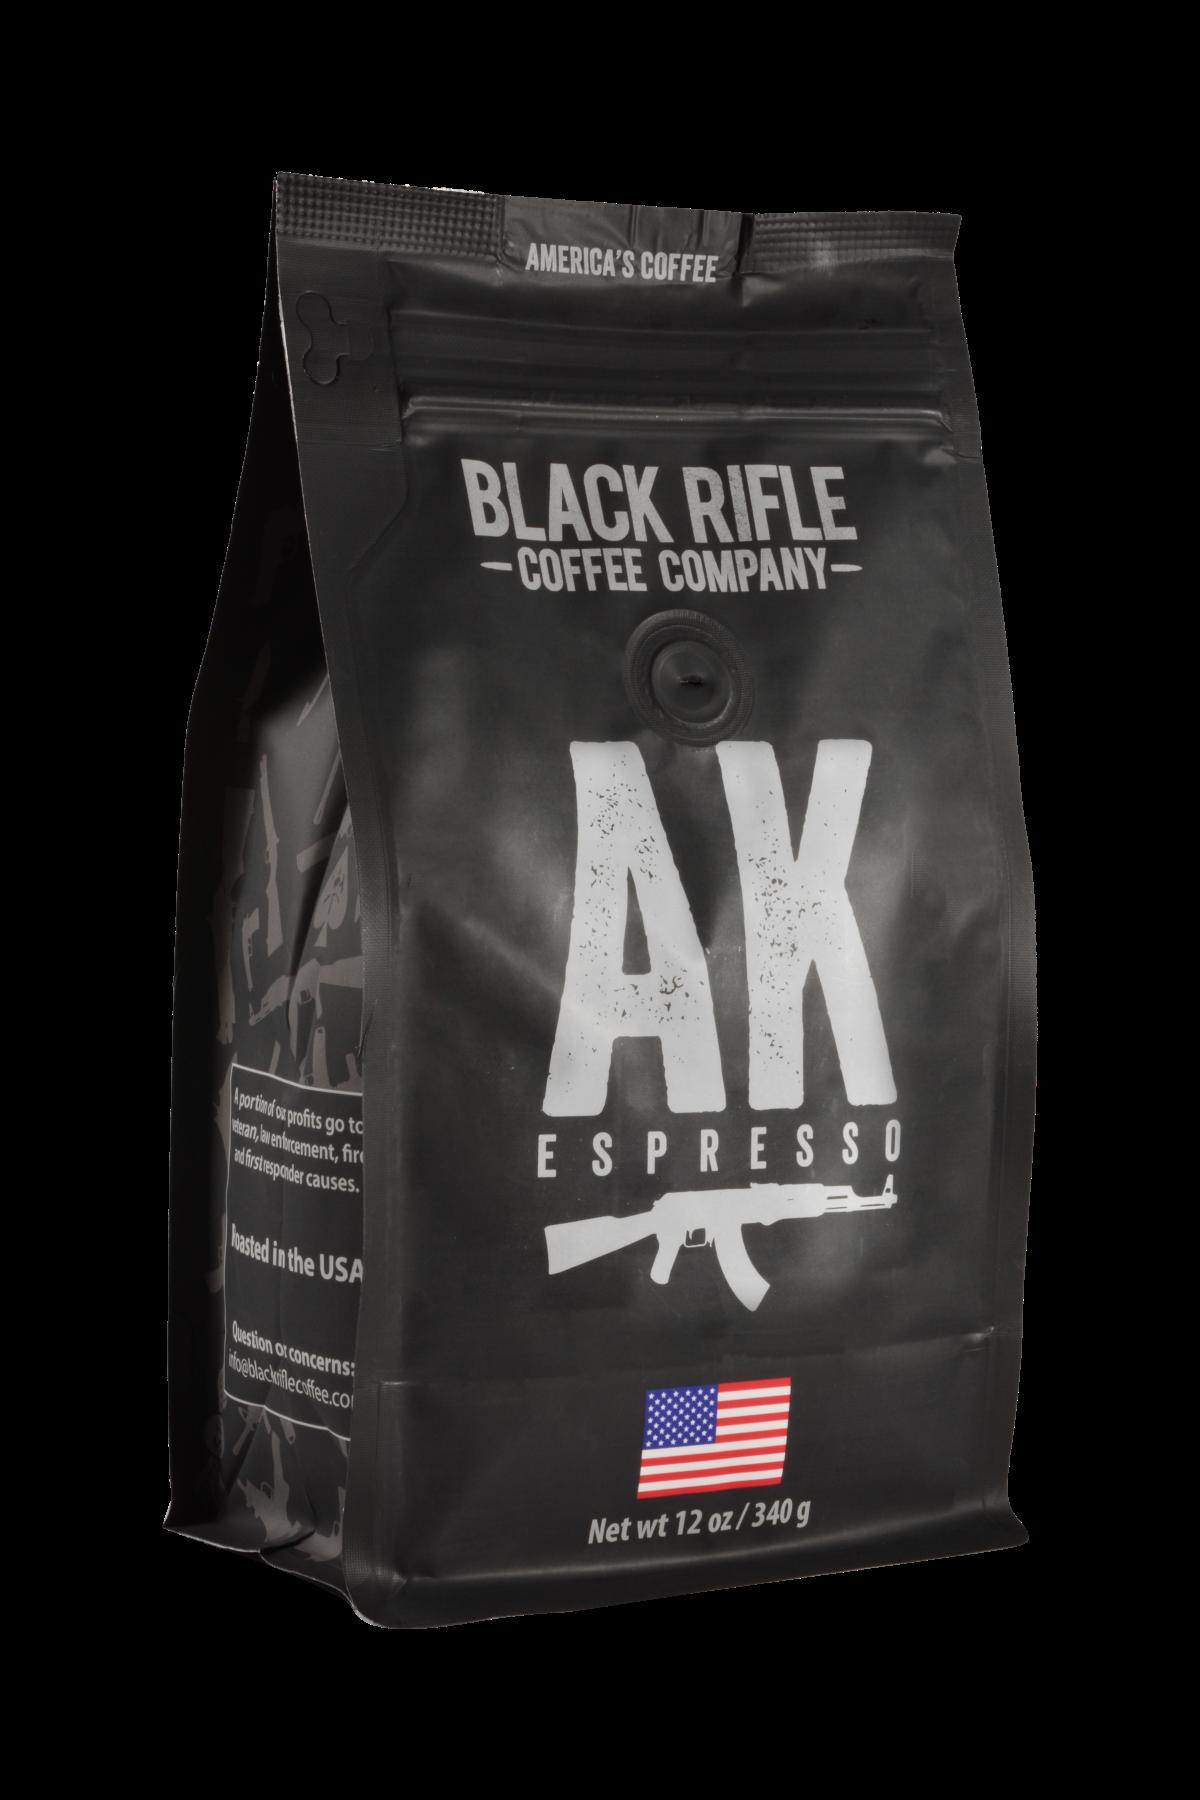 Black Rifle Coffee AK-47 Espresso Blend Coffee - 12 oz ground